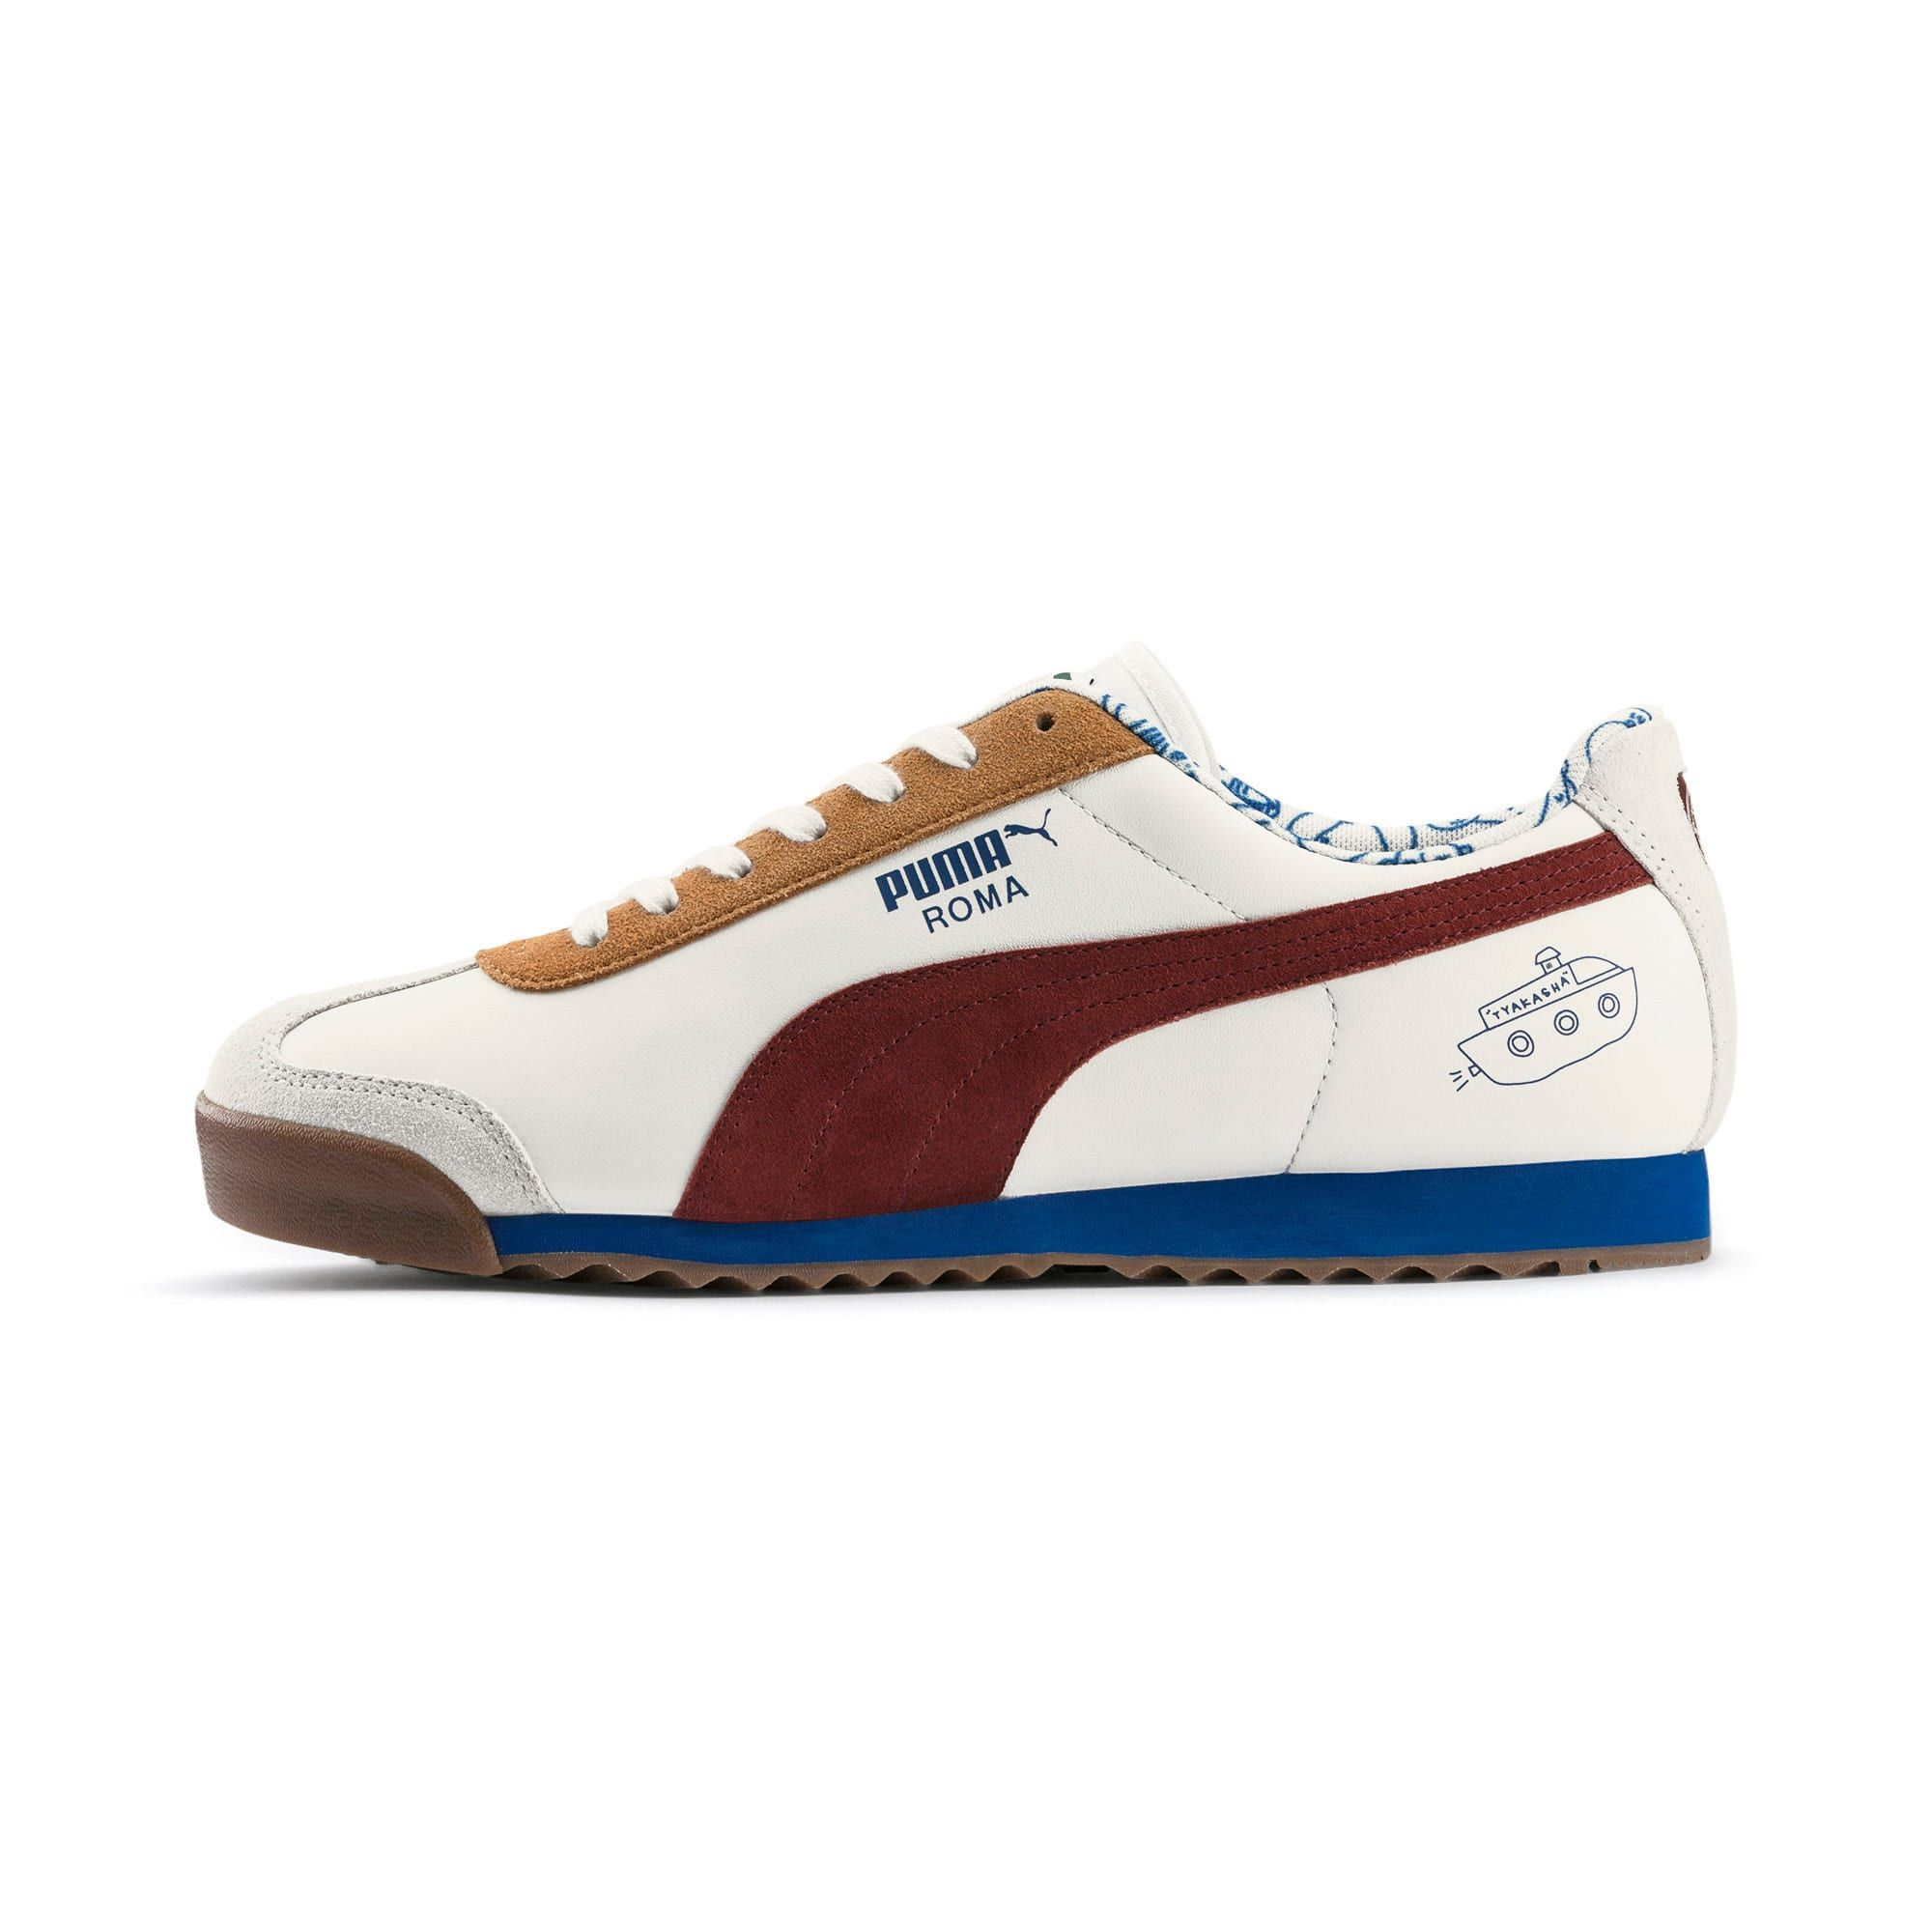 PUMA x TYAKASHA Roma Trainers   Sneakers, Pumas shoes, Trainers